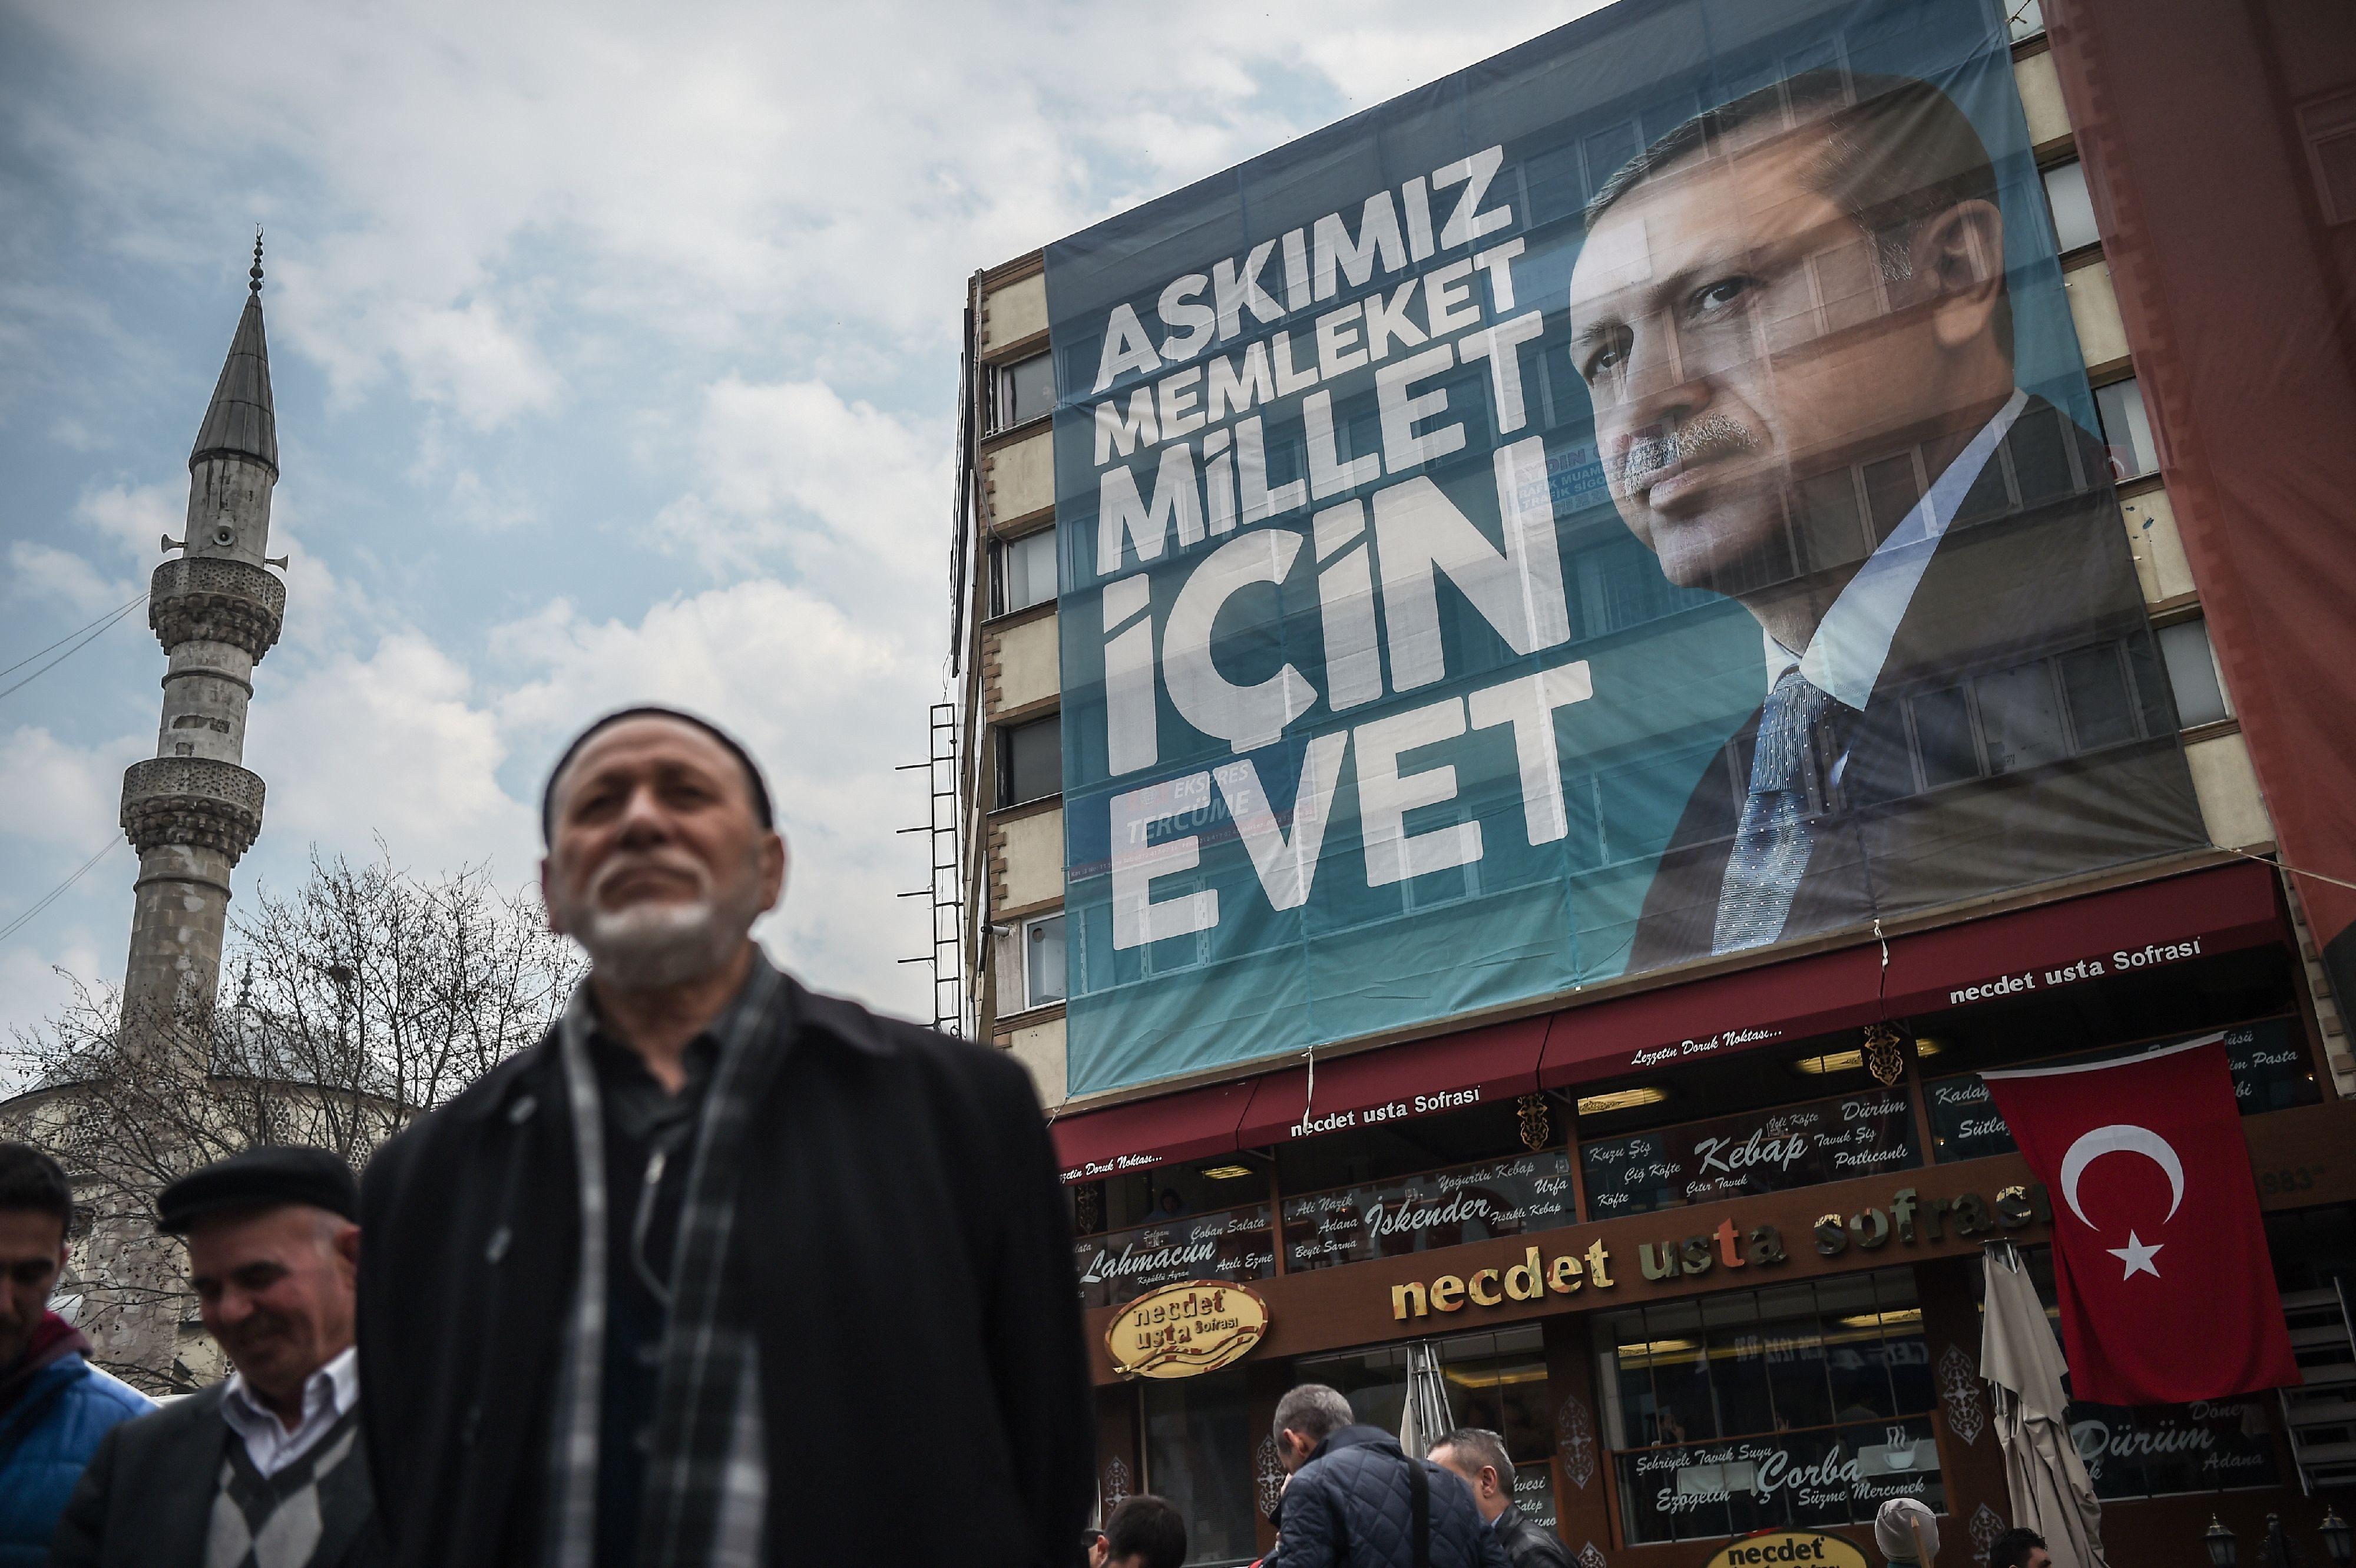 صور لأردوغان